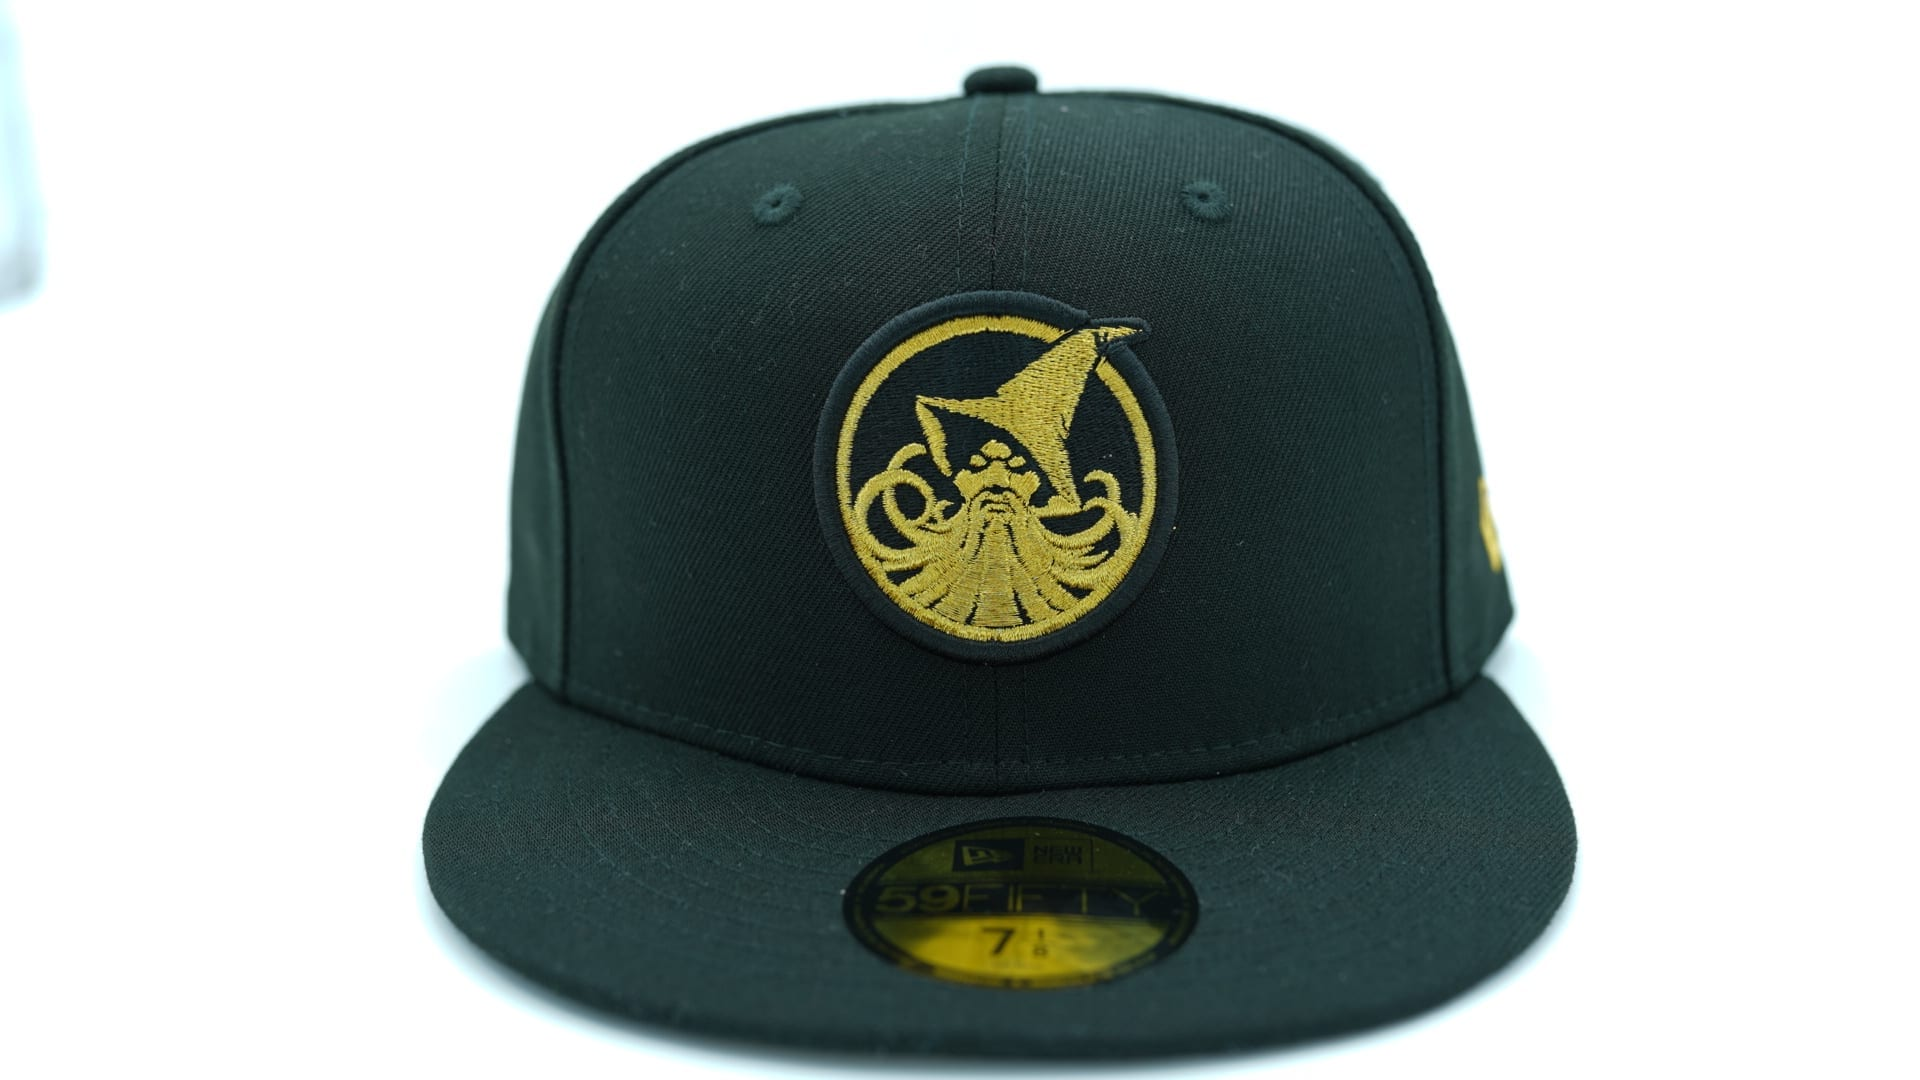 ... twins enterprise fitted baseball cap hat ca3f20076f5